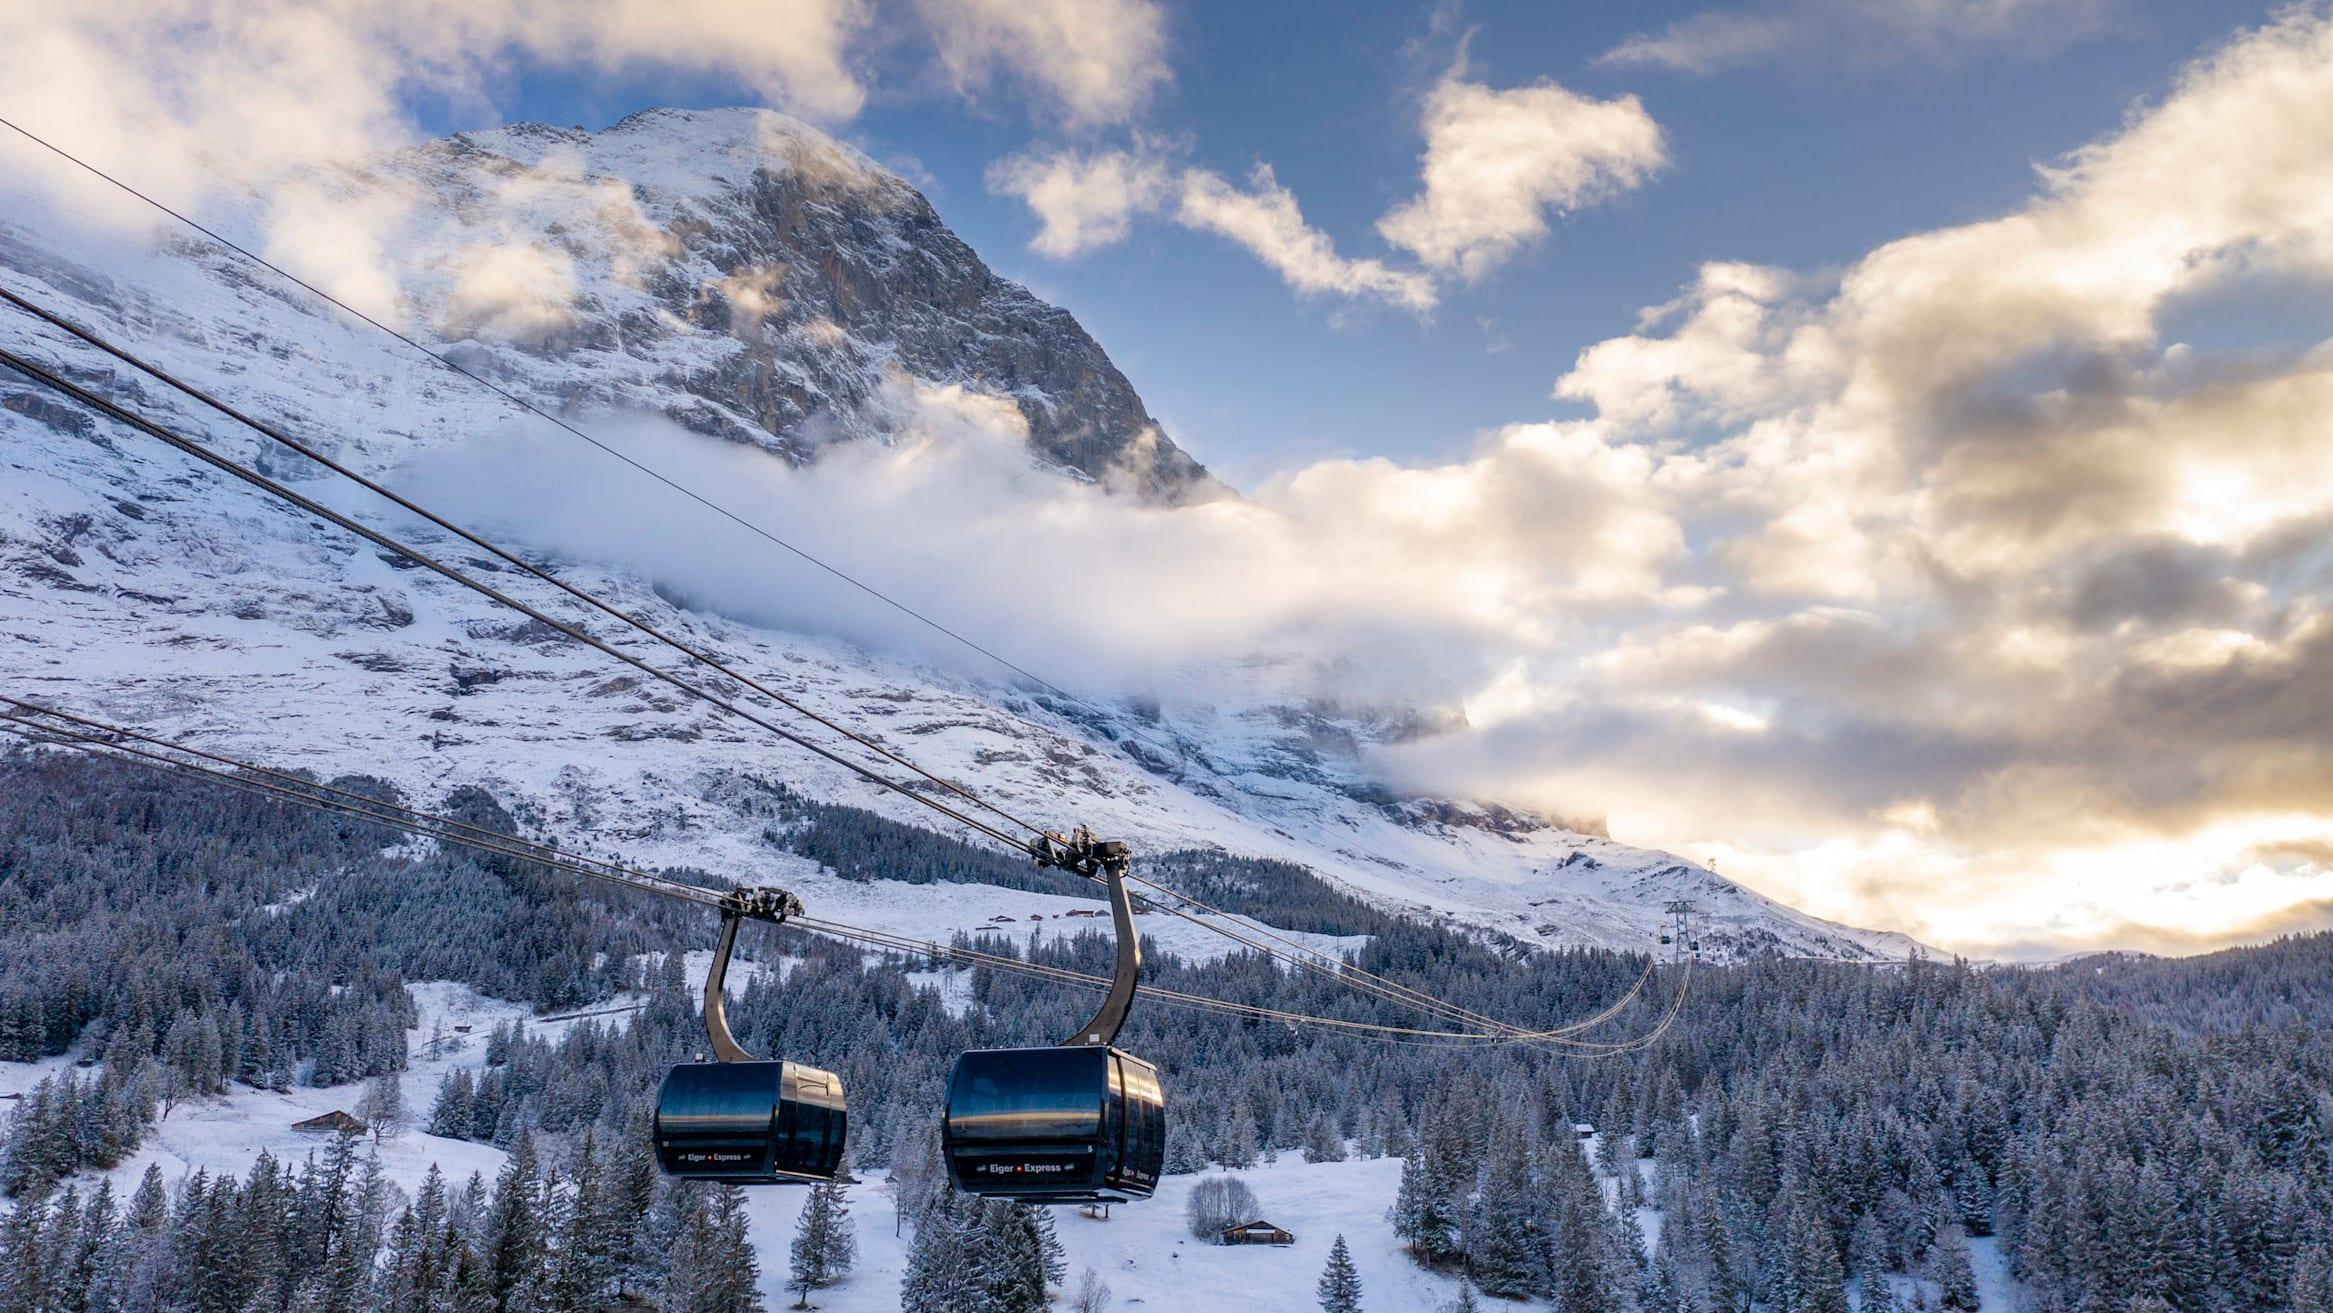 3sbahn, BernerOberland, Eiger, Gondel, Gondelbahn, Grindelwald, Jungfrau, Kabinenbahn, November, Schweiz, Seilbahn, Switzerland, Terminal, Transport, Winter, jungfraubahnen, vbahn